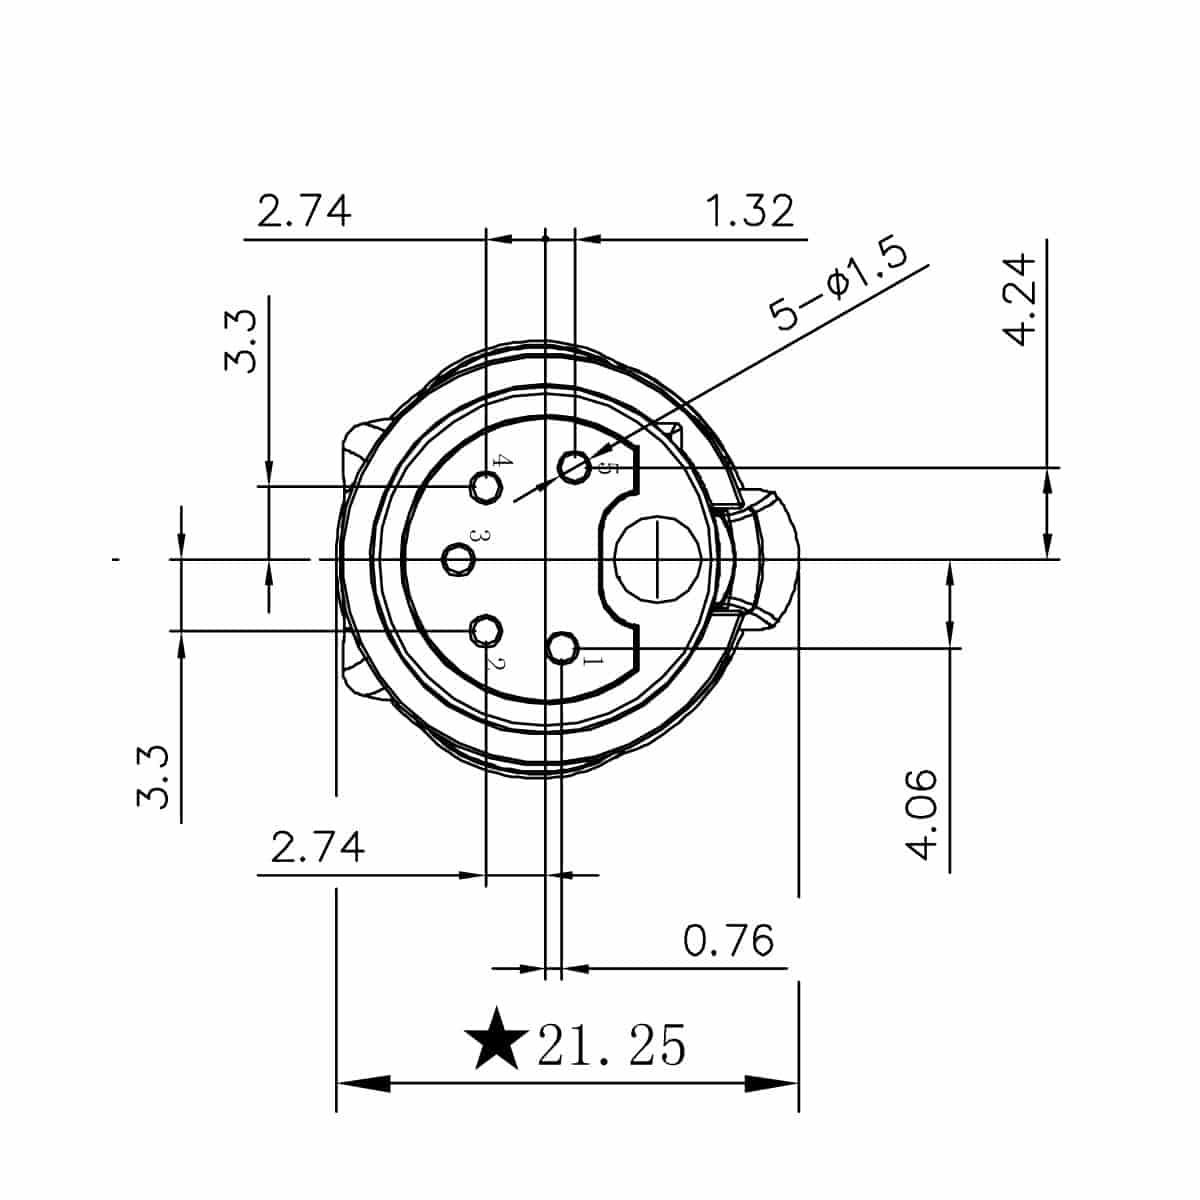 Enova Outdoor Xlr Cable Connector Waterproof Ip67 5 Pol